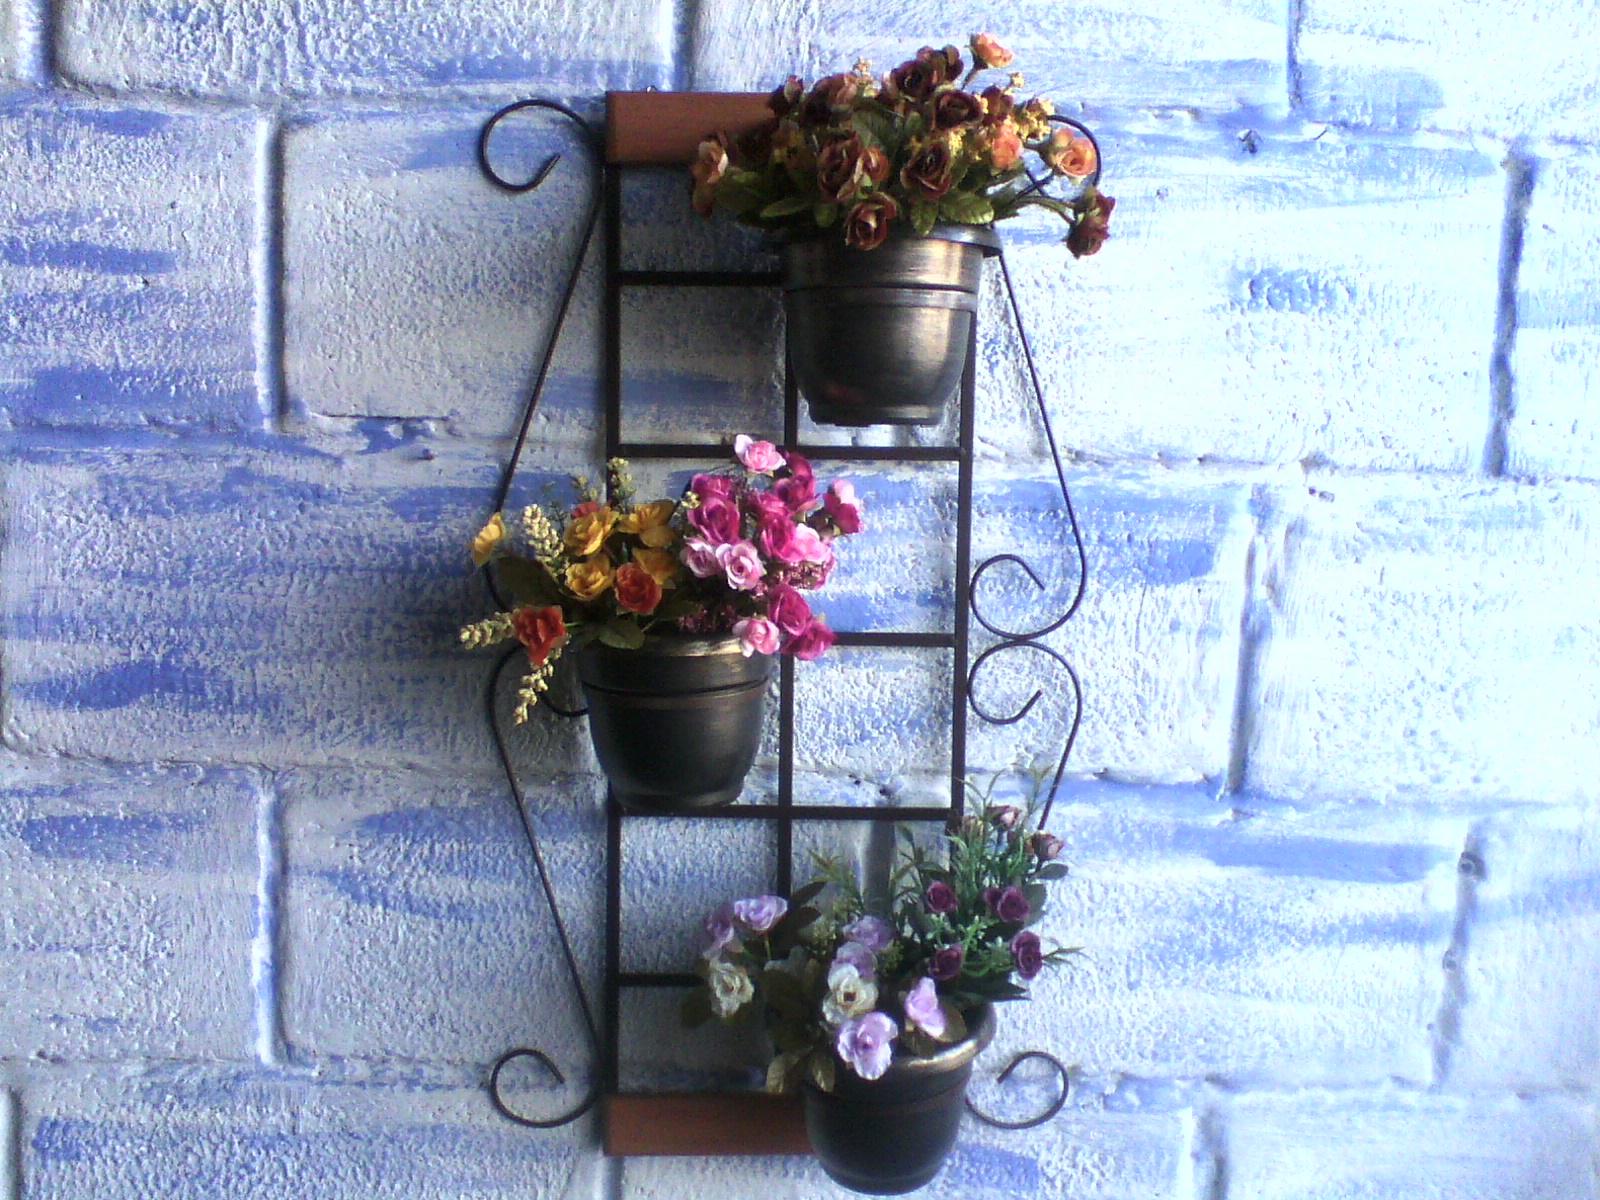 trelica jardim vertical:trelica para jardim vertical com vasos metal trelica para jardim